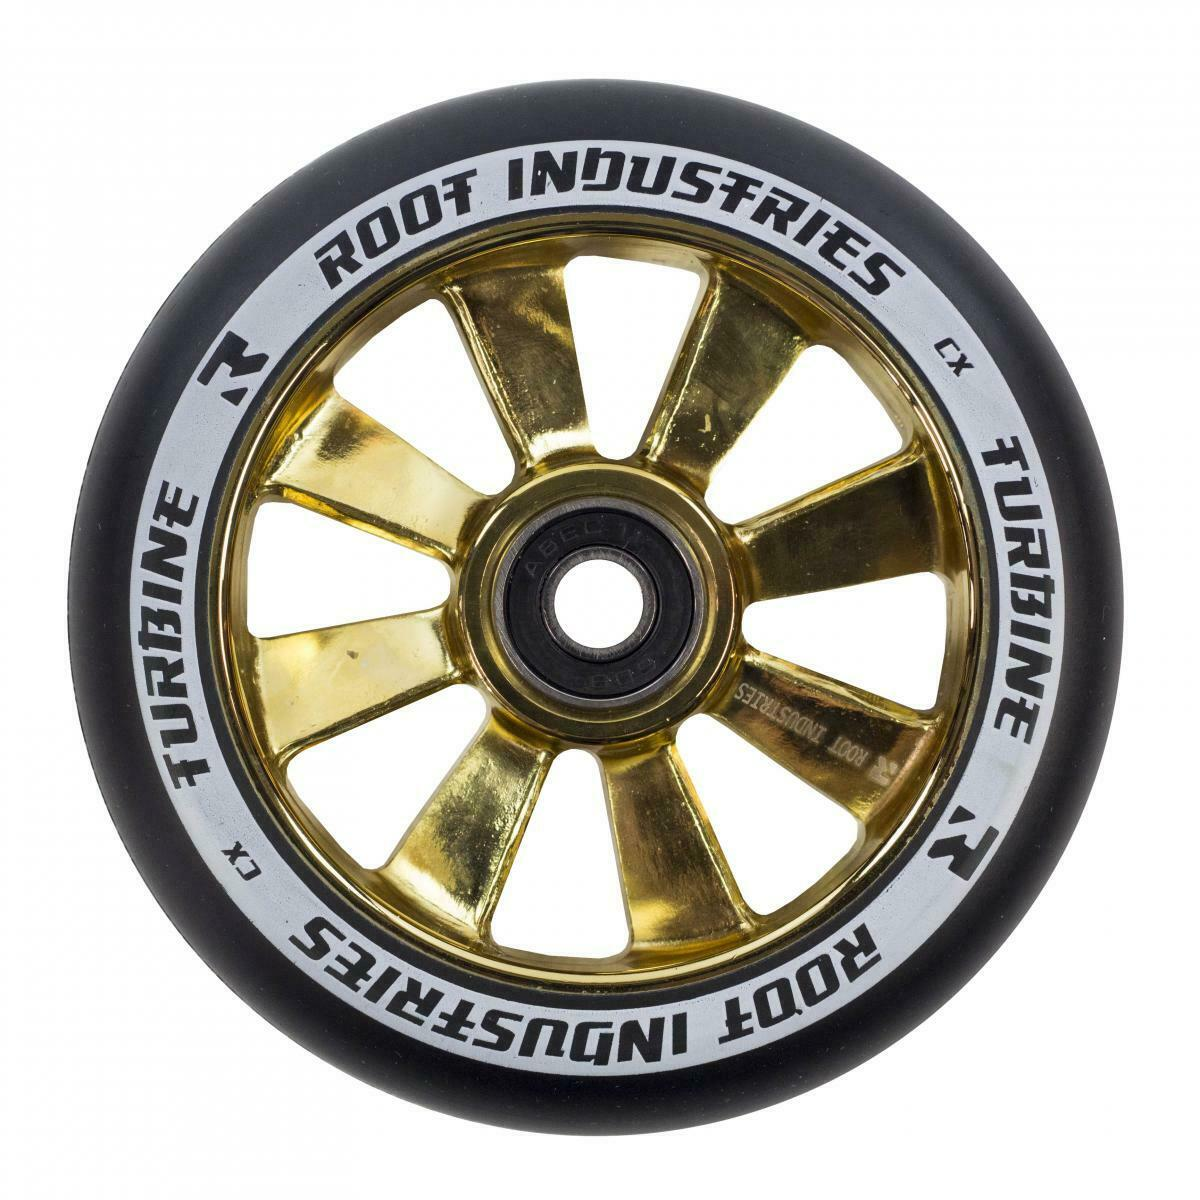 Root Industries Turbine Stunt Scooter Reel 110mm gold